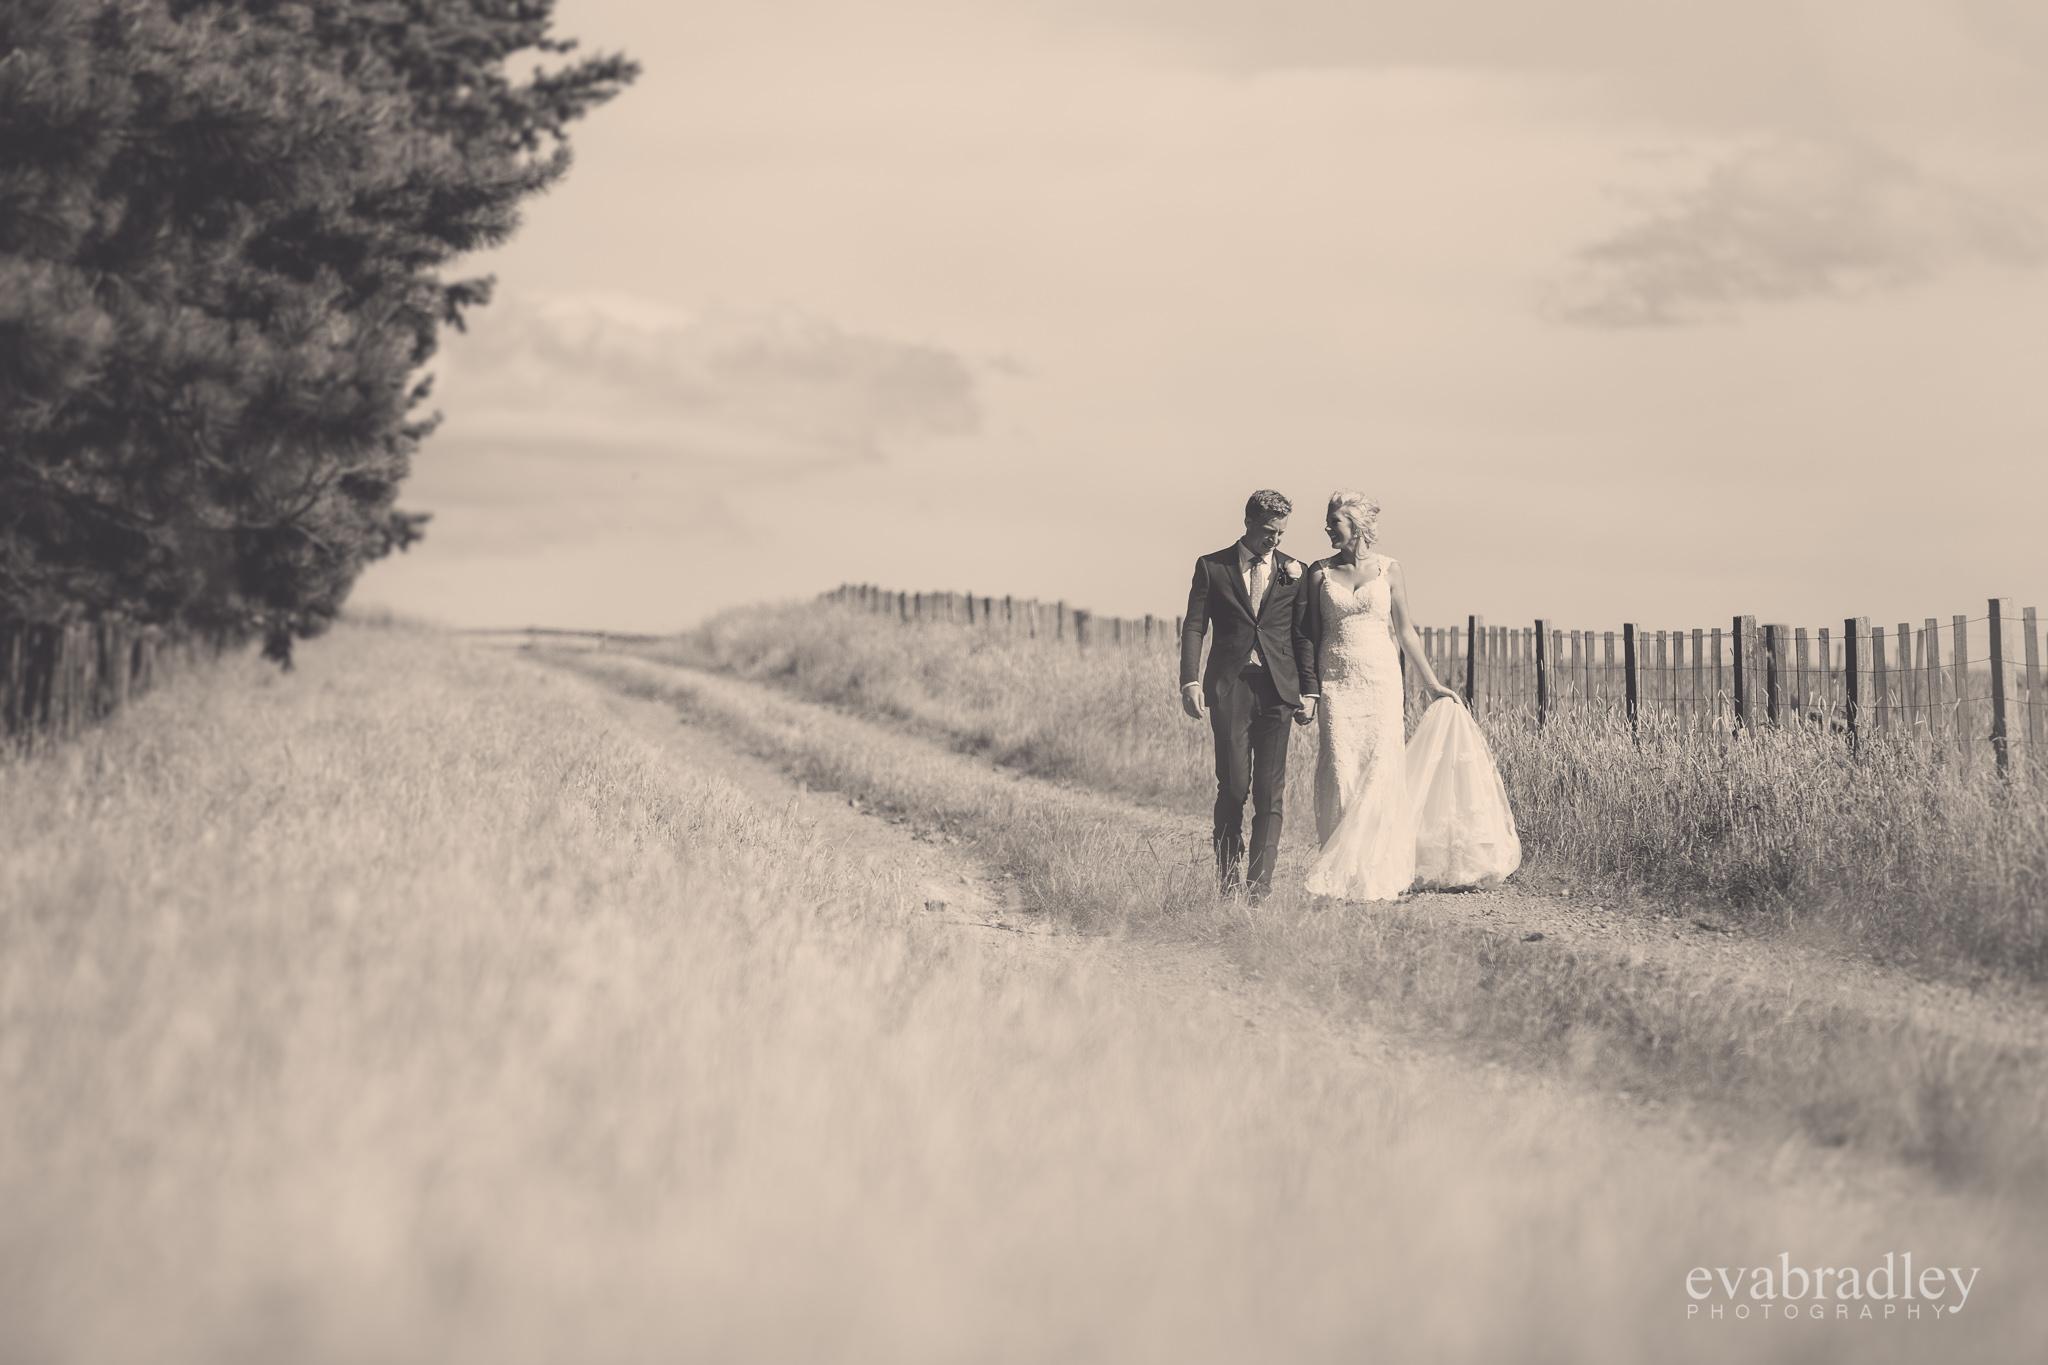 country-weddings-nz-new-zealand-eva